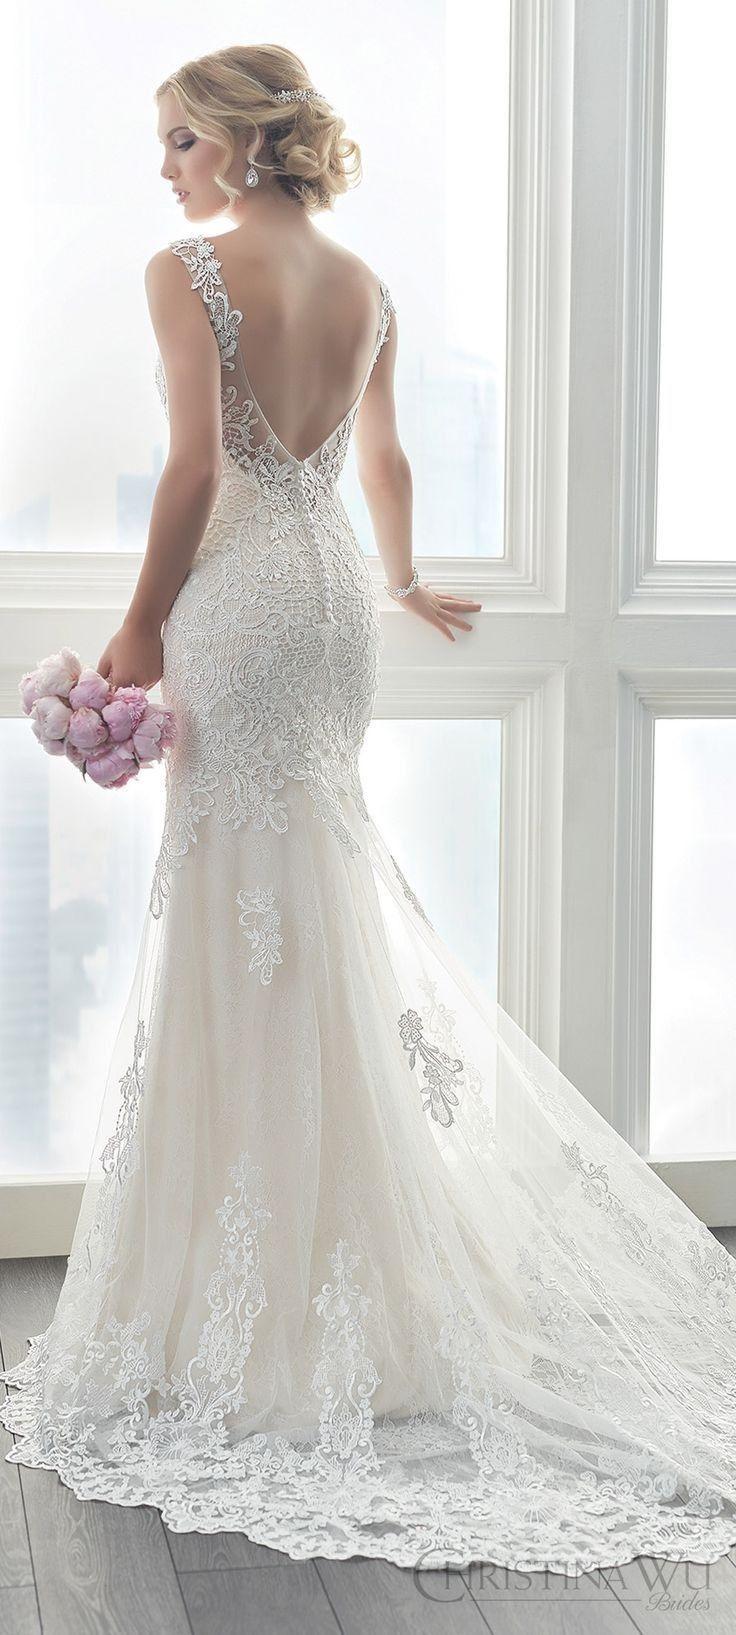 Best vintage wedding dress designers  Wedding Dresses Vintage Look at your ideal custommade wedding